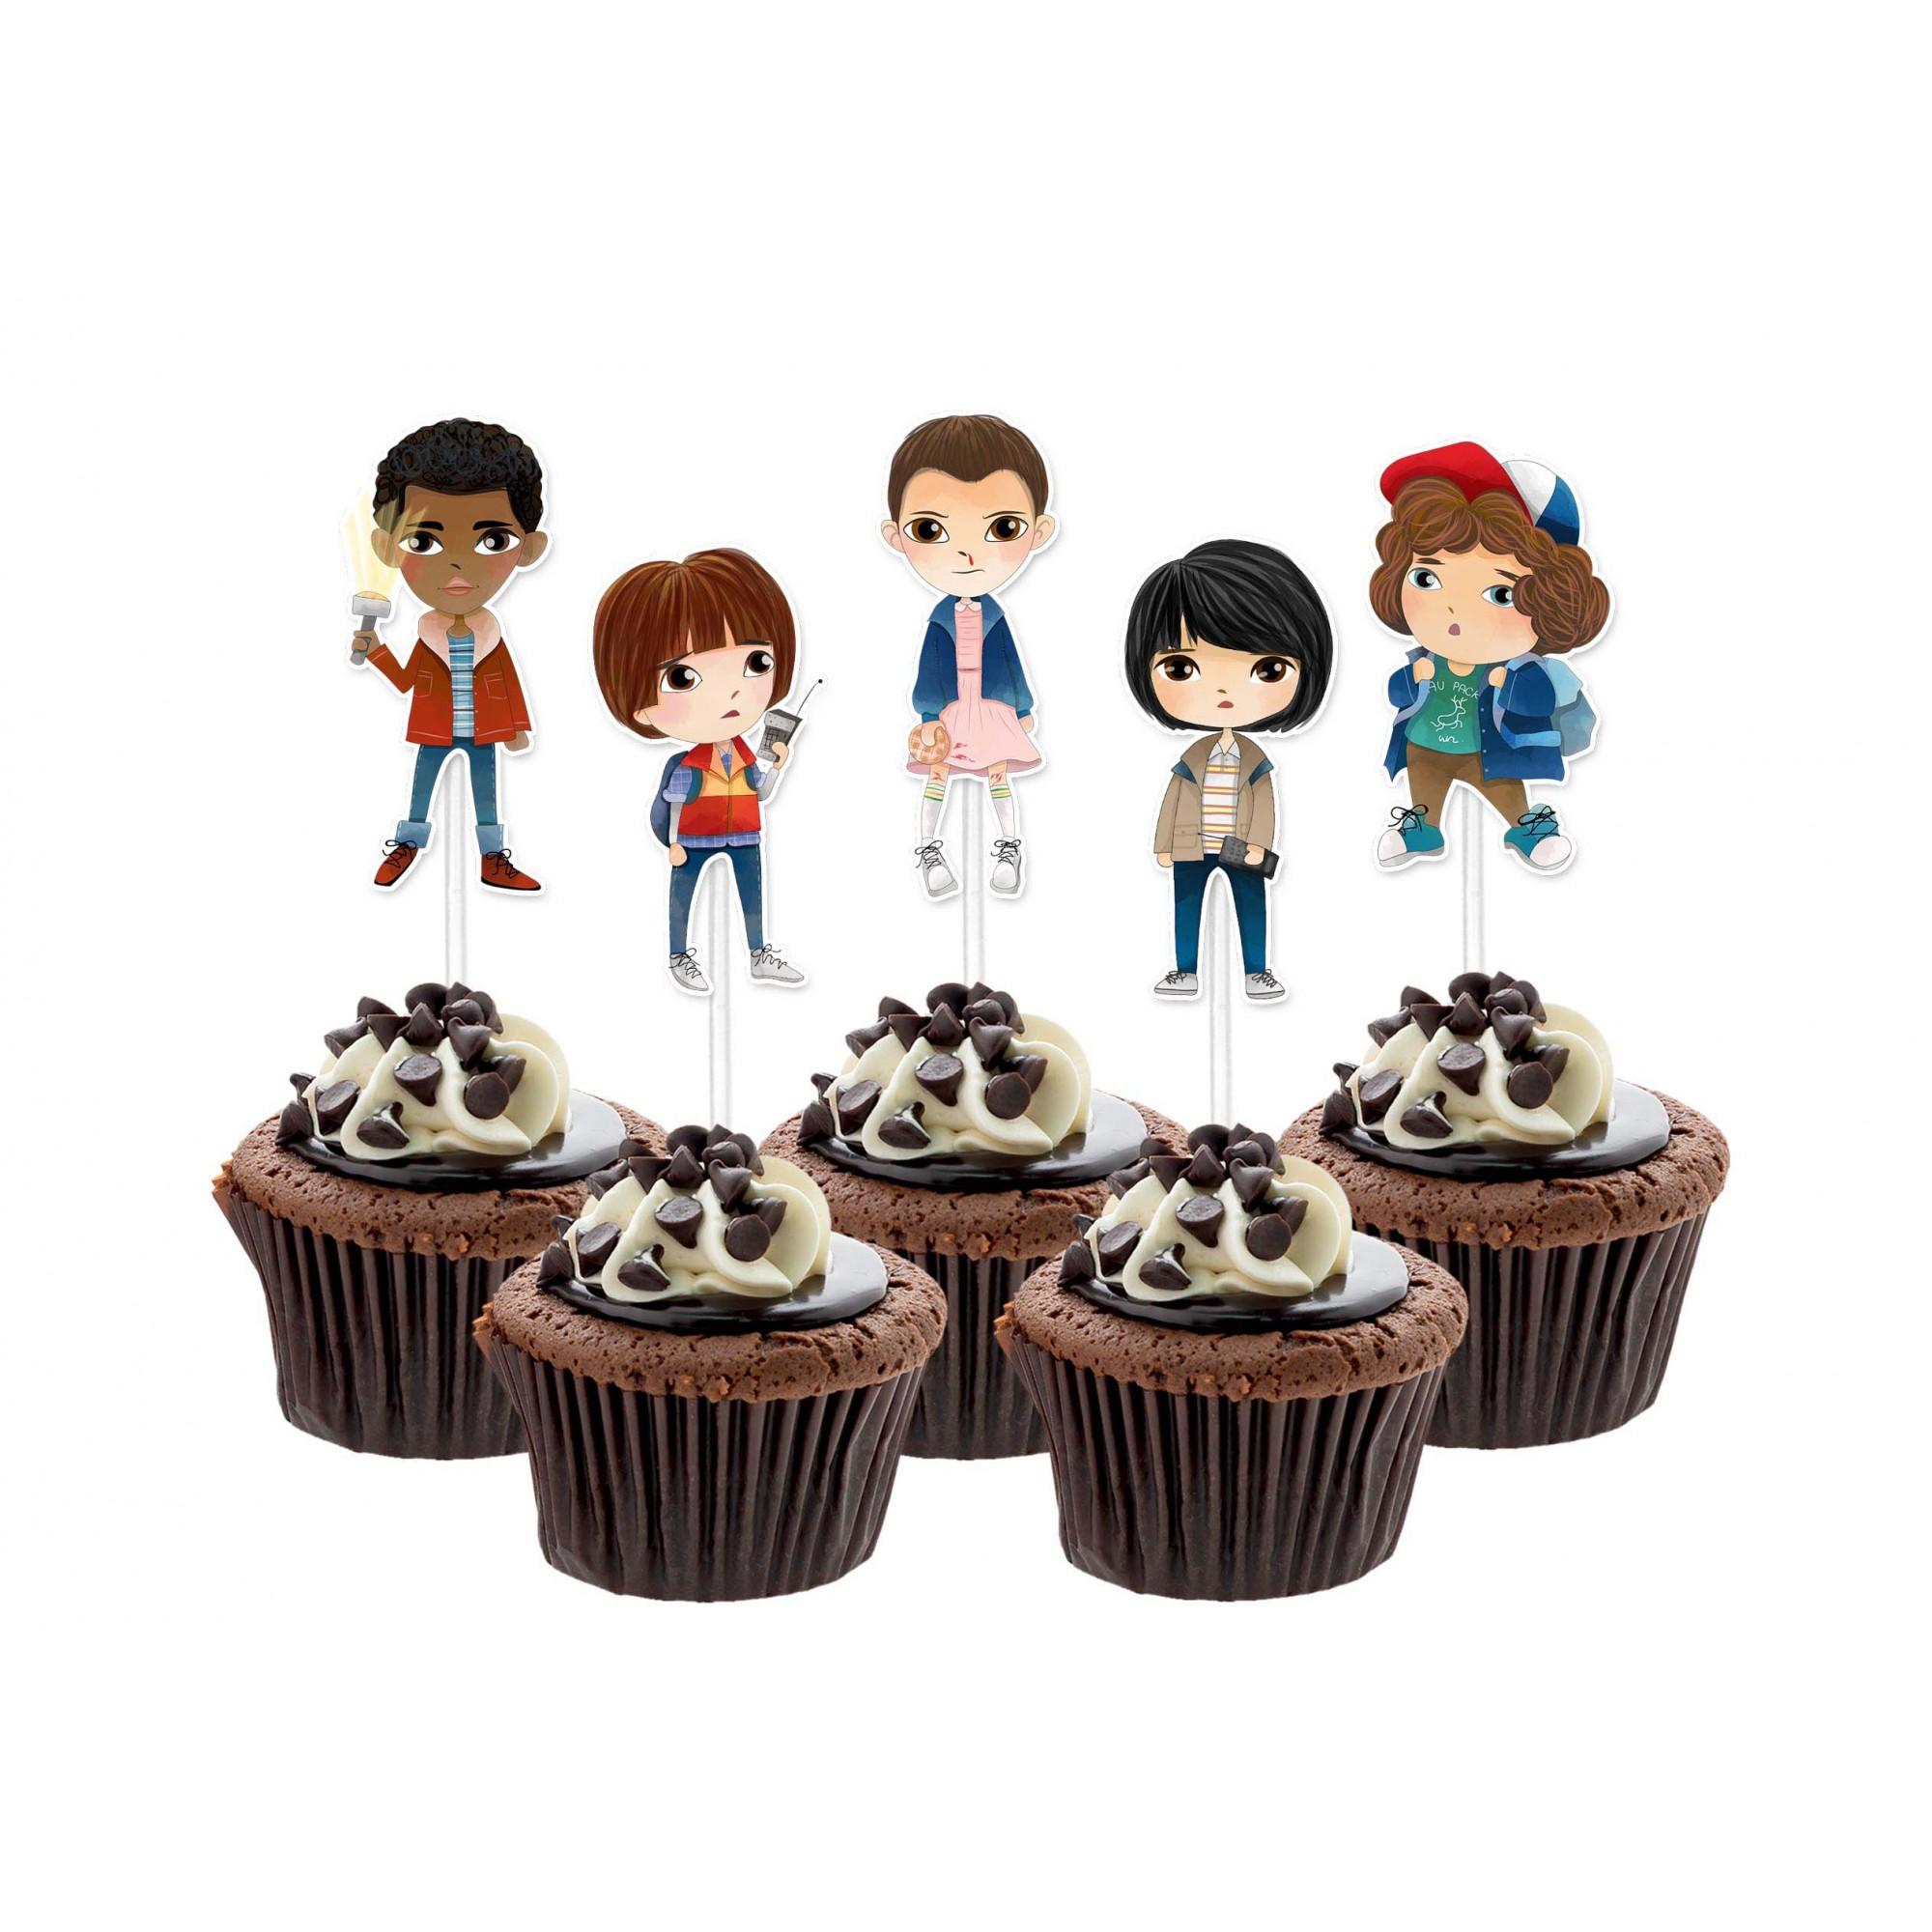 Topper Stranger Things Cupcake